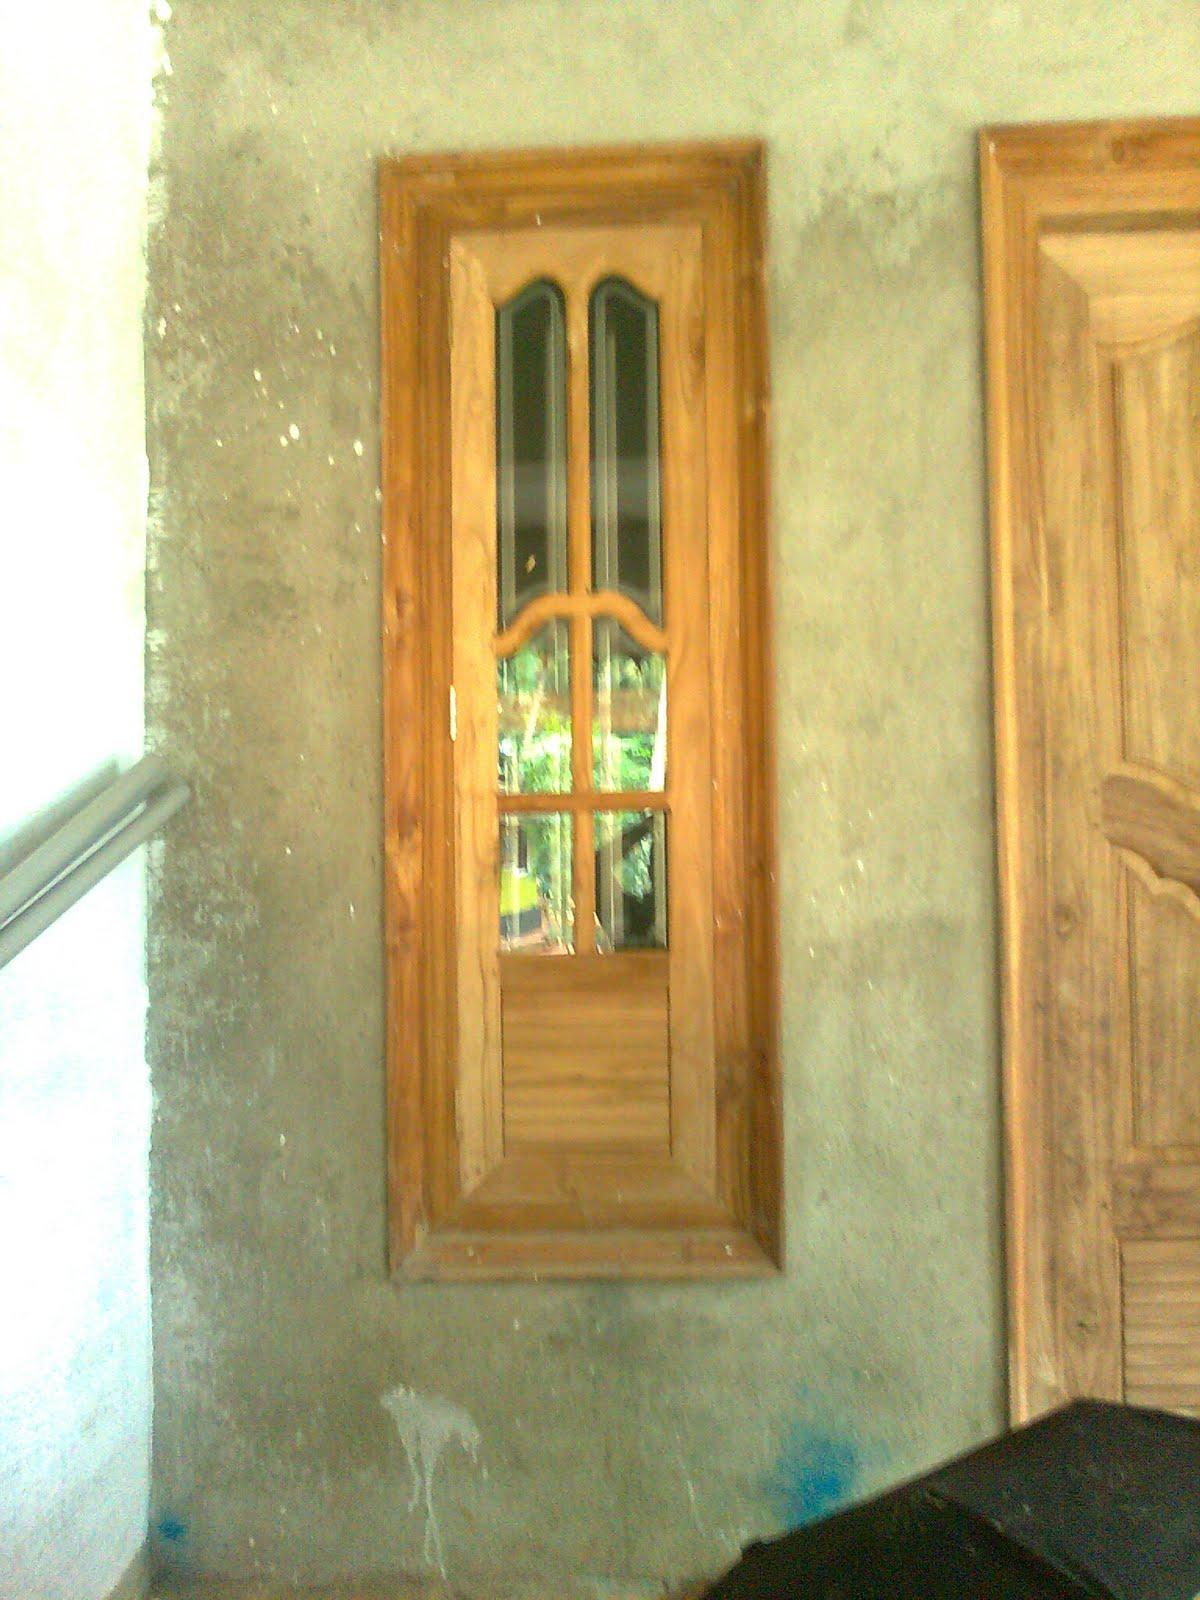 Kerala Style Carpenter Works And Designs September 2013: BAVAS WOOD WORKS: Wooden Window Doors Simple Designs